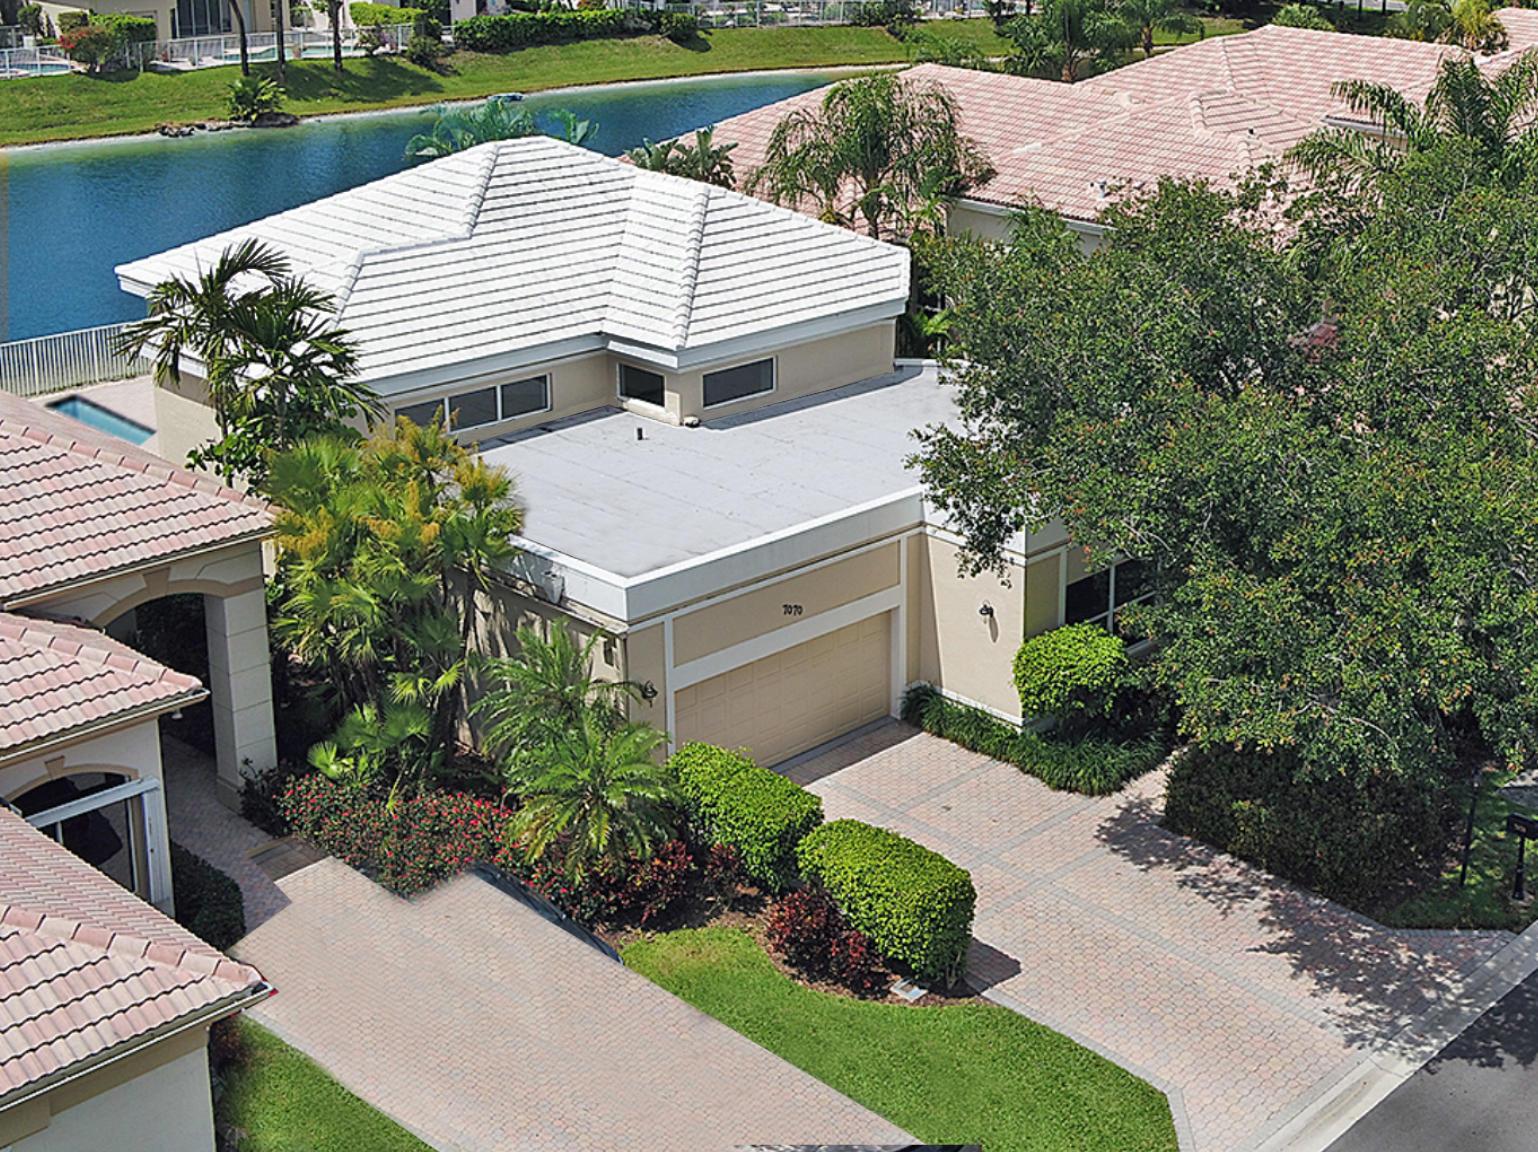 Details for 7070 Islegrove Place, Boca Raton, FL 33433